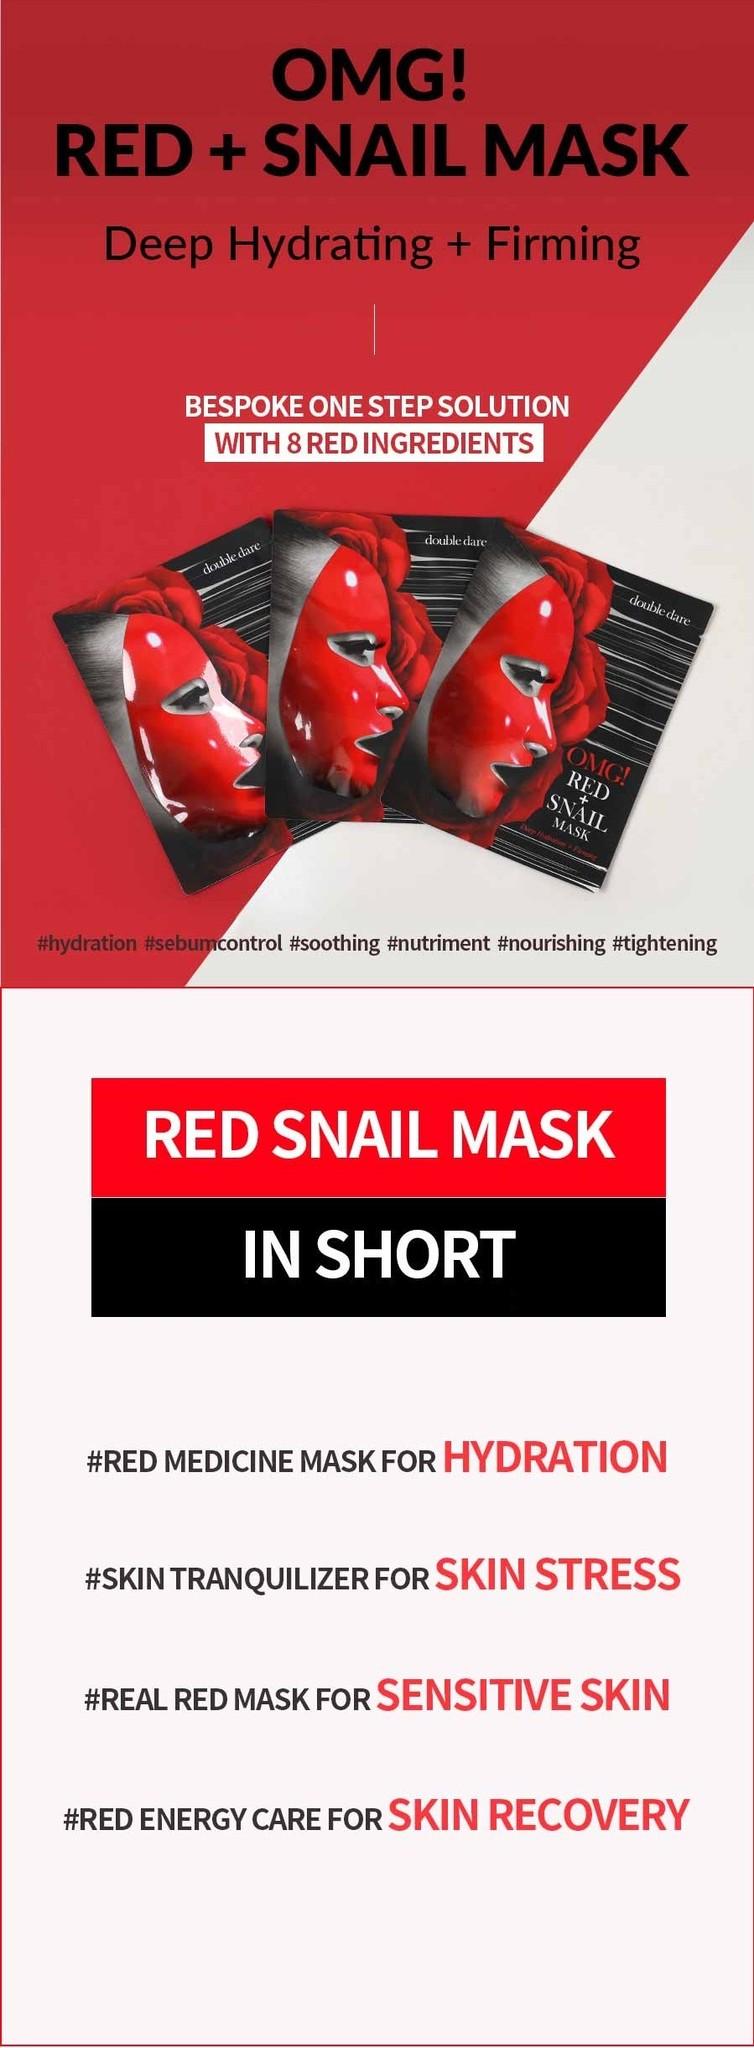 OMG! Red + Snail Mask Sheet-3